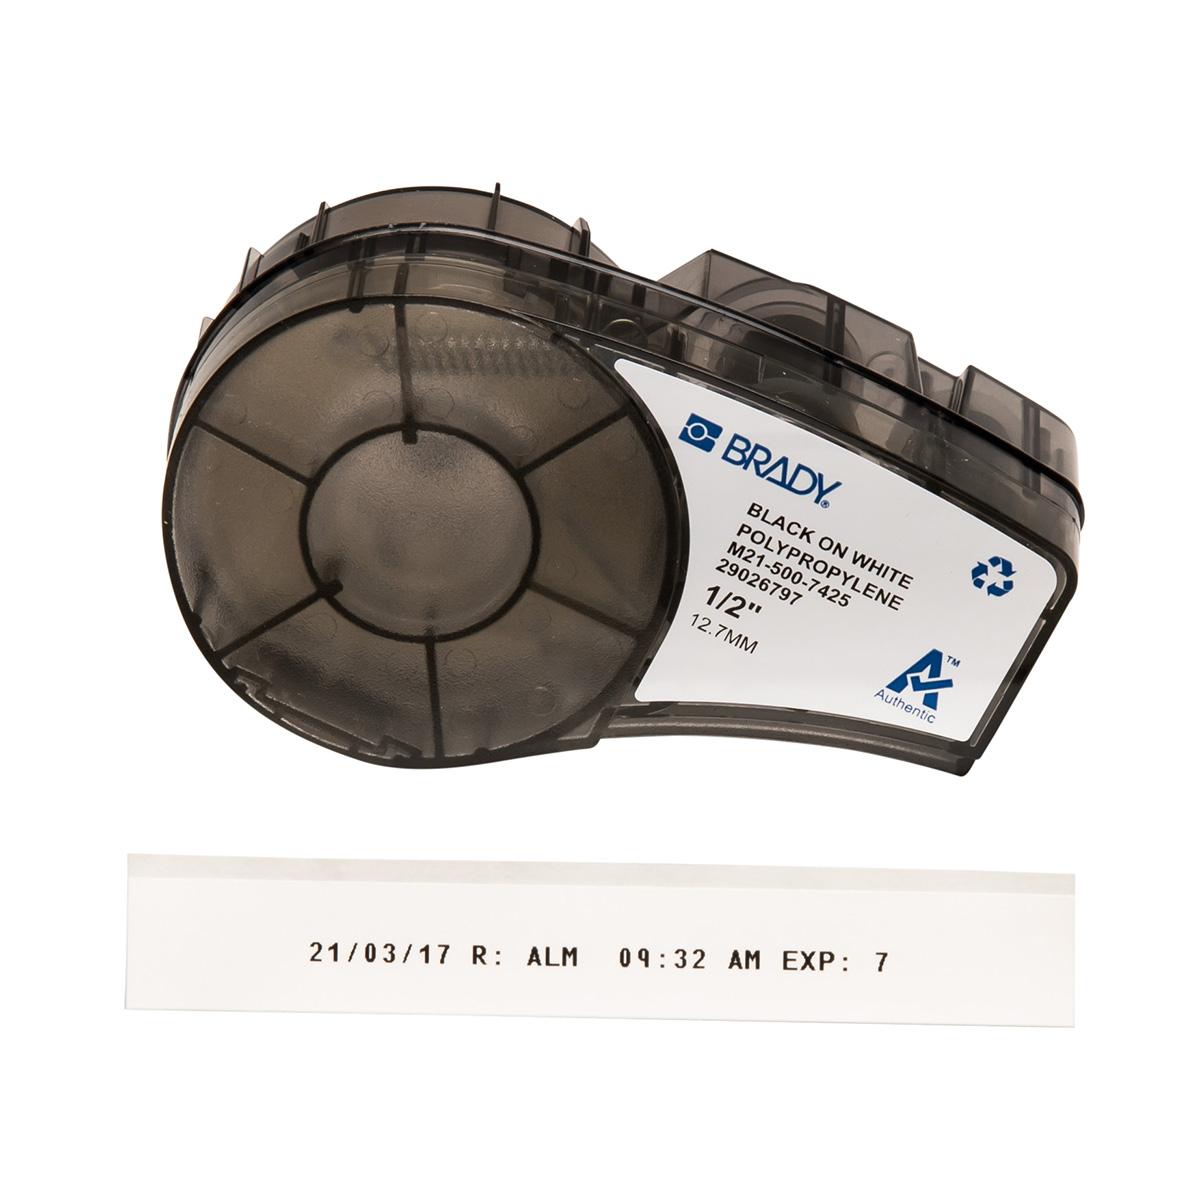 BRAM21-500-7425 LABEL,BMP21,B7425,0.5